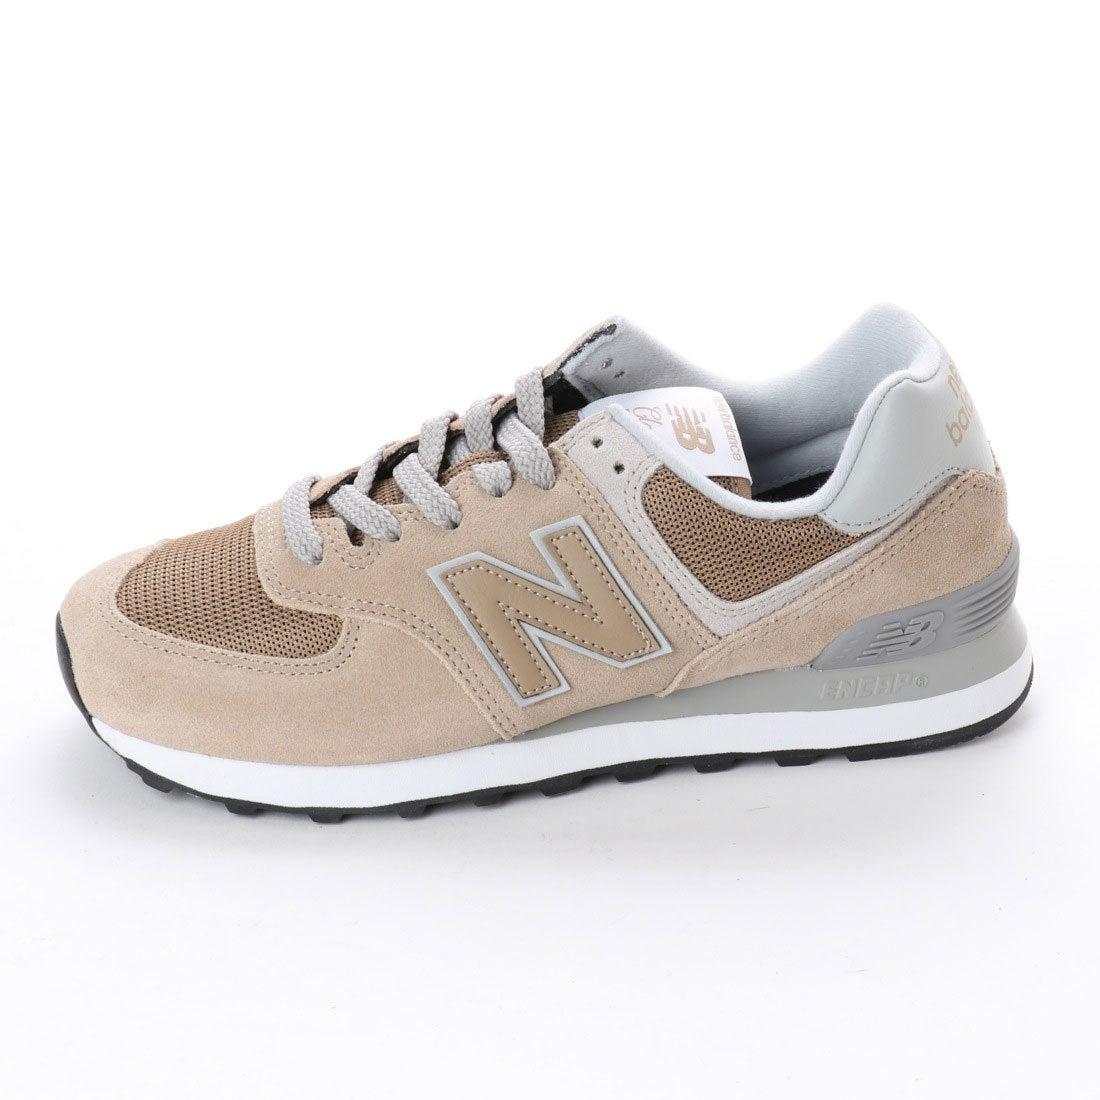 29bed328c25ae ニューバランス new balance NB ML574 EBE (EBE(ヘンプ)) -靴 ...